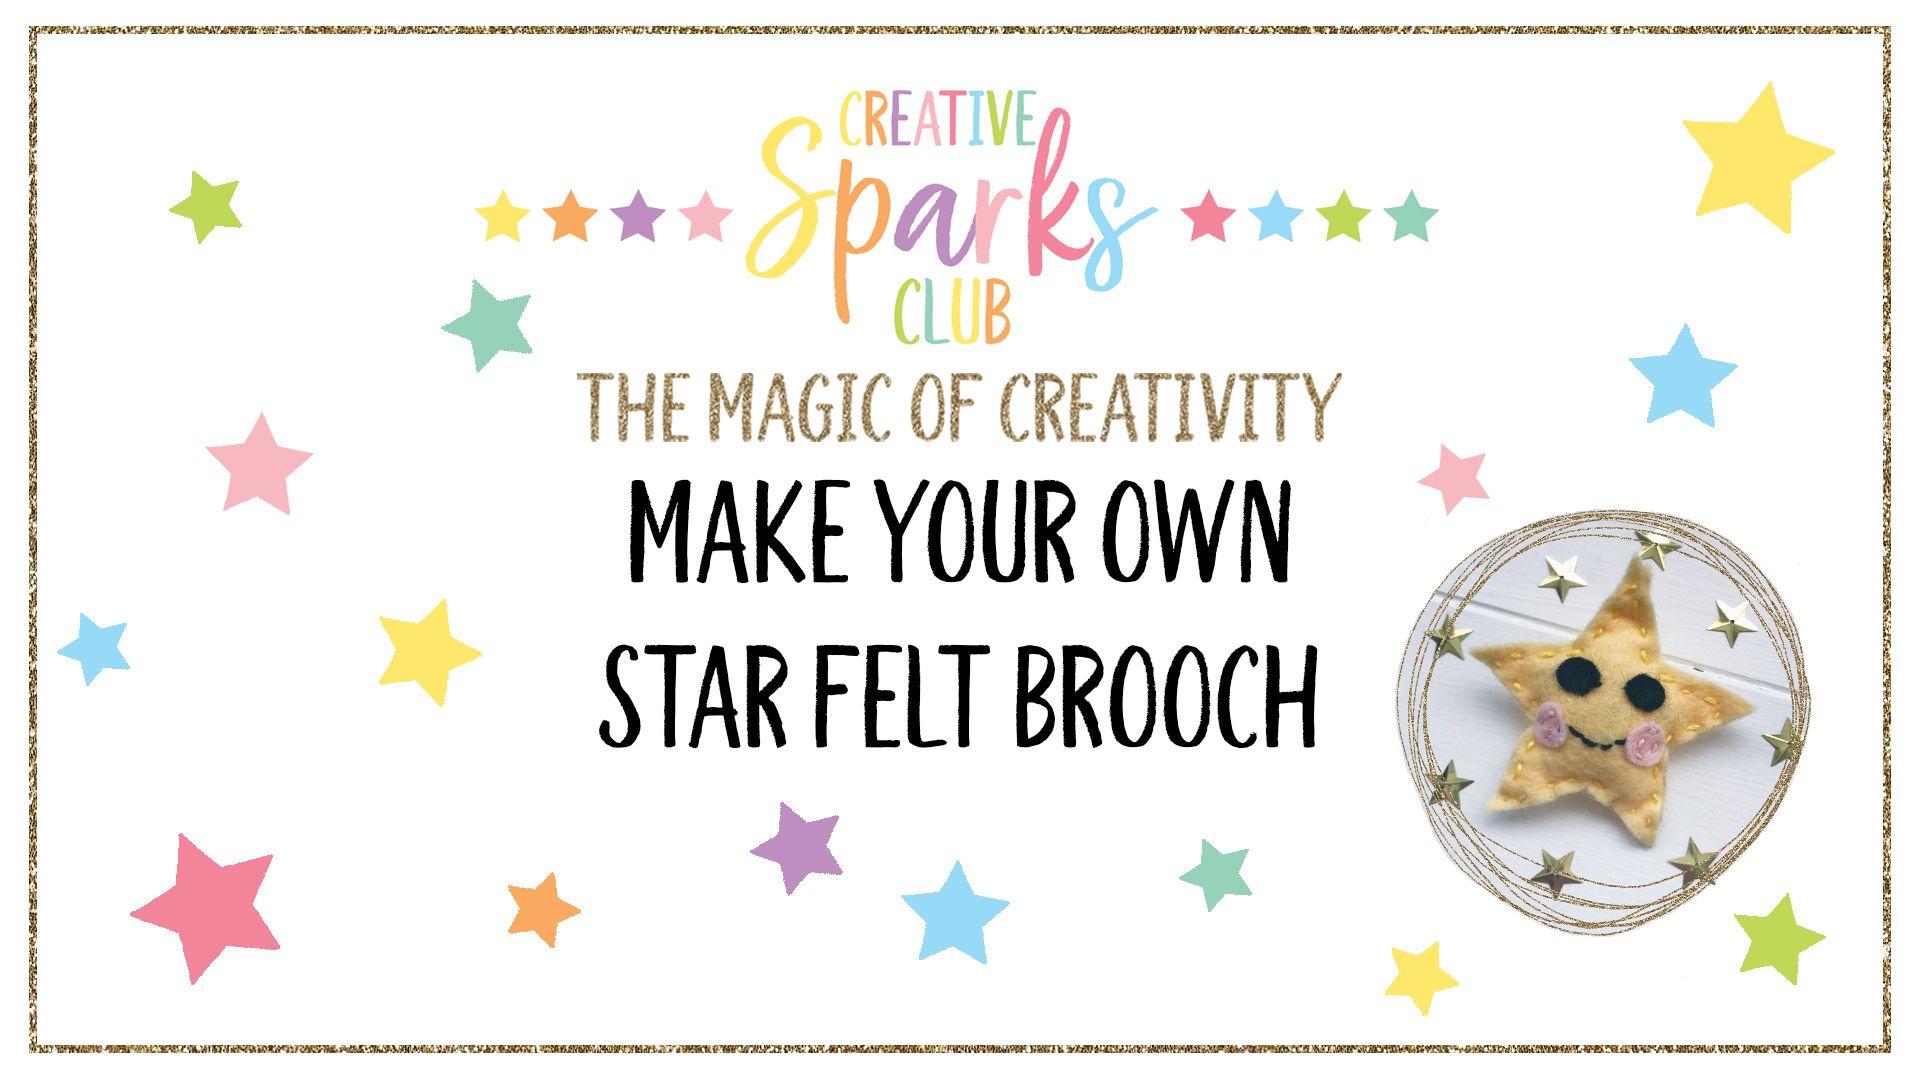 MAKE YOUR OWN STAR FELT BROOCH